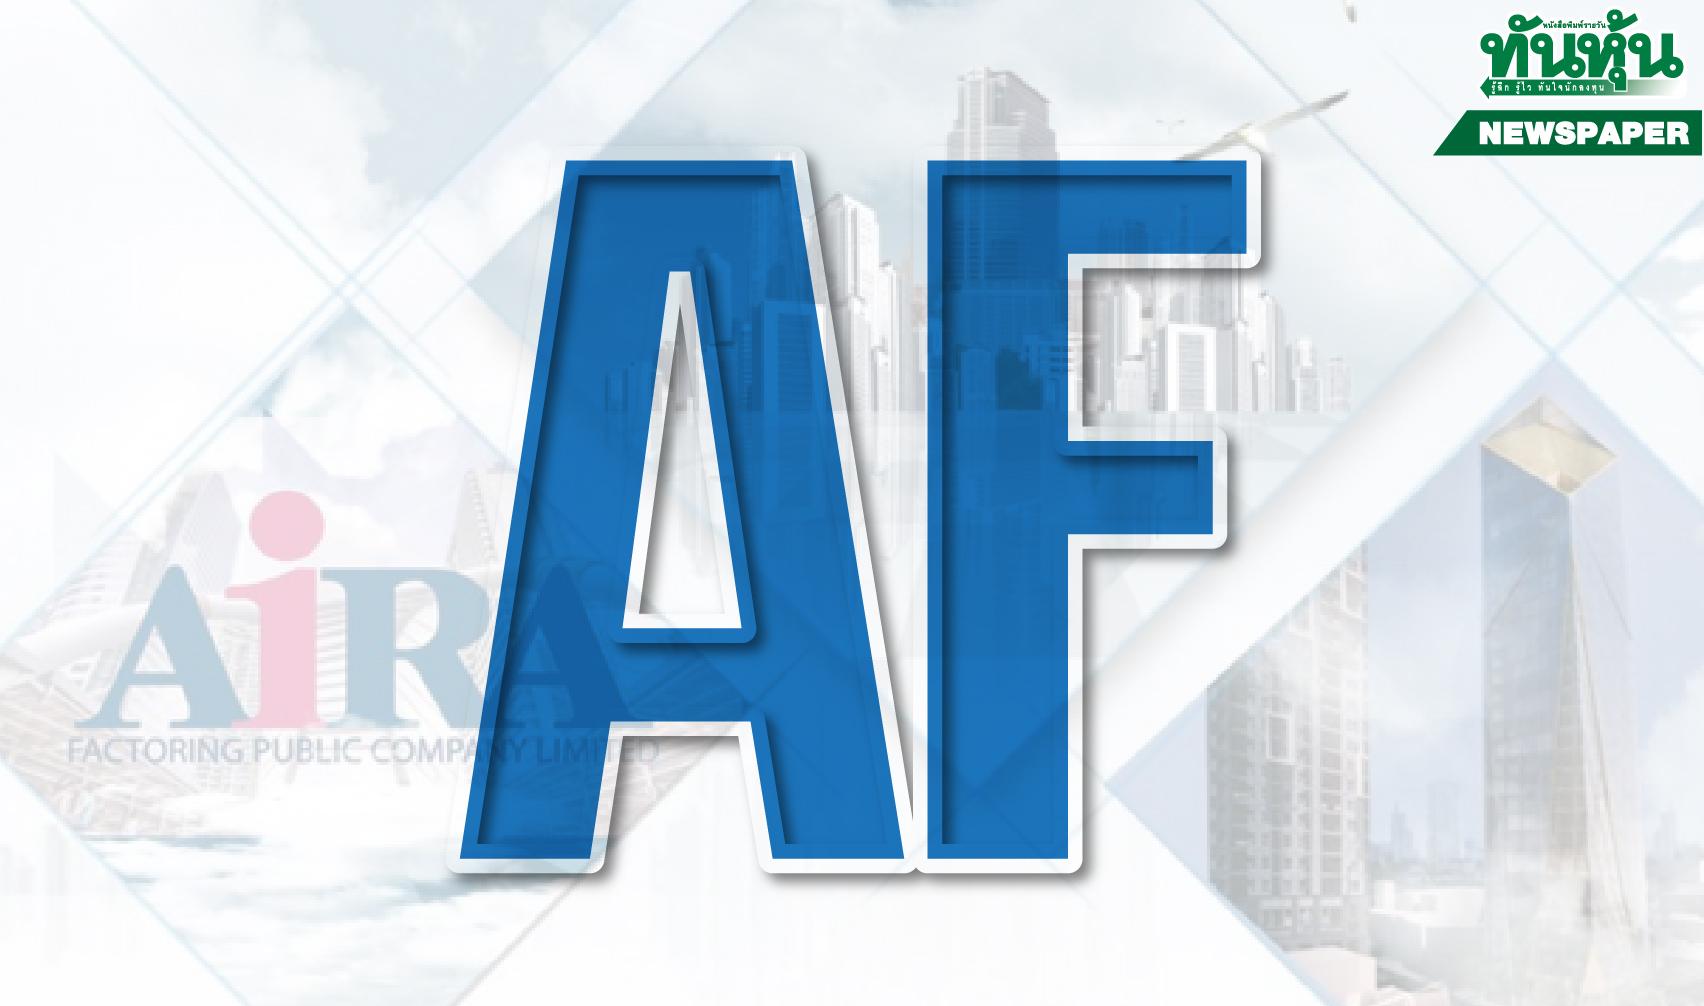 AF ปรับโครงสร้างธุรกิจครั้งใหญ่ ลุยแพลตฟอร์มใหม่-อัพฐานลูกค้า